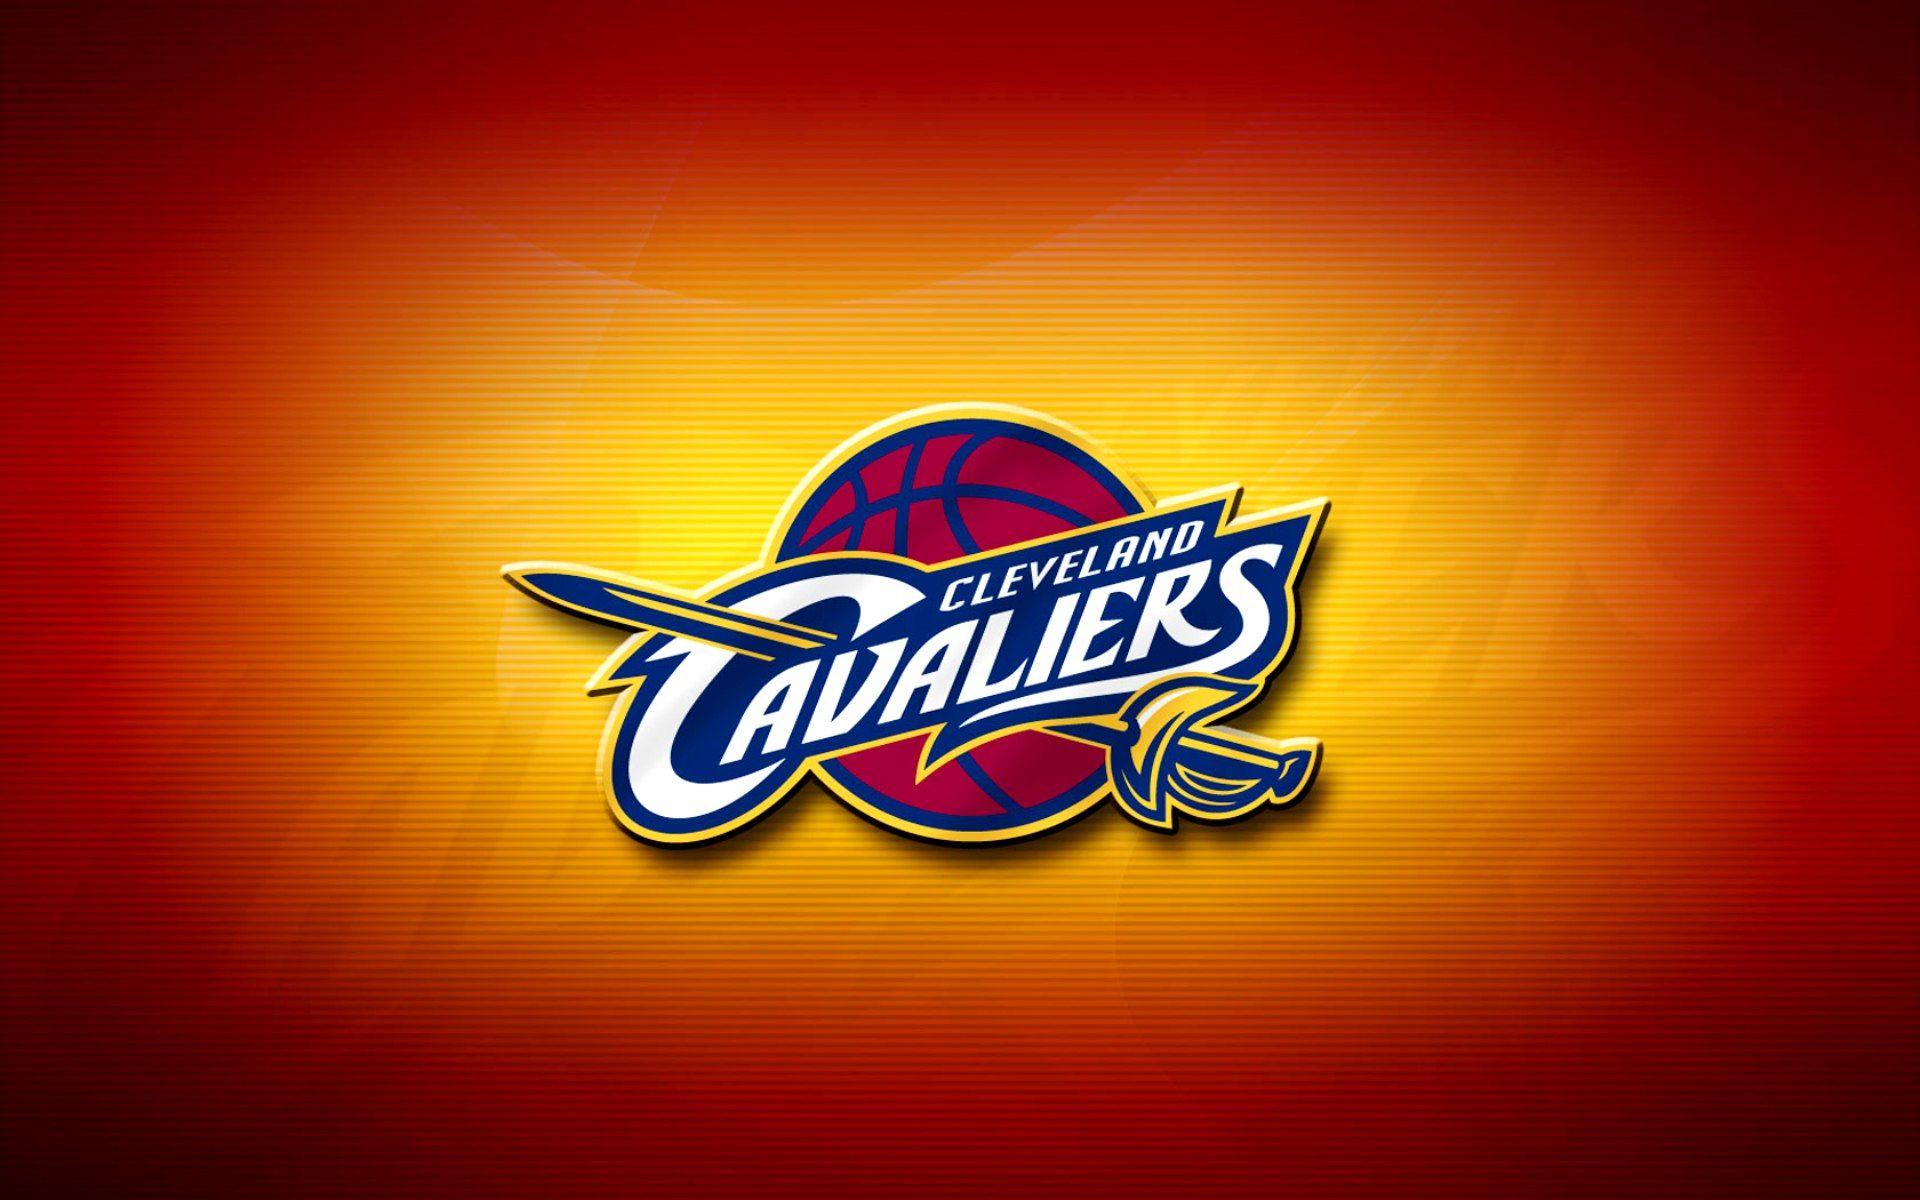 Cleveland Cavaliers Logo Wallpaper >> Nba Team Logos Wallpaper 2015 - WallpaperSafari